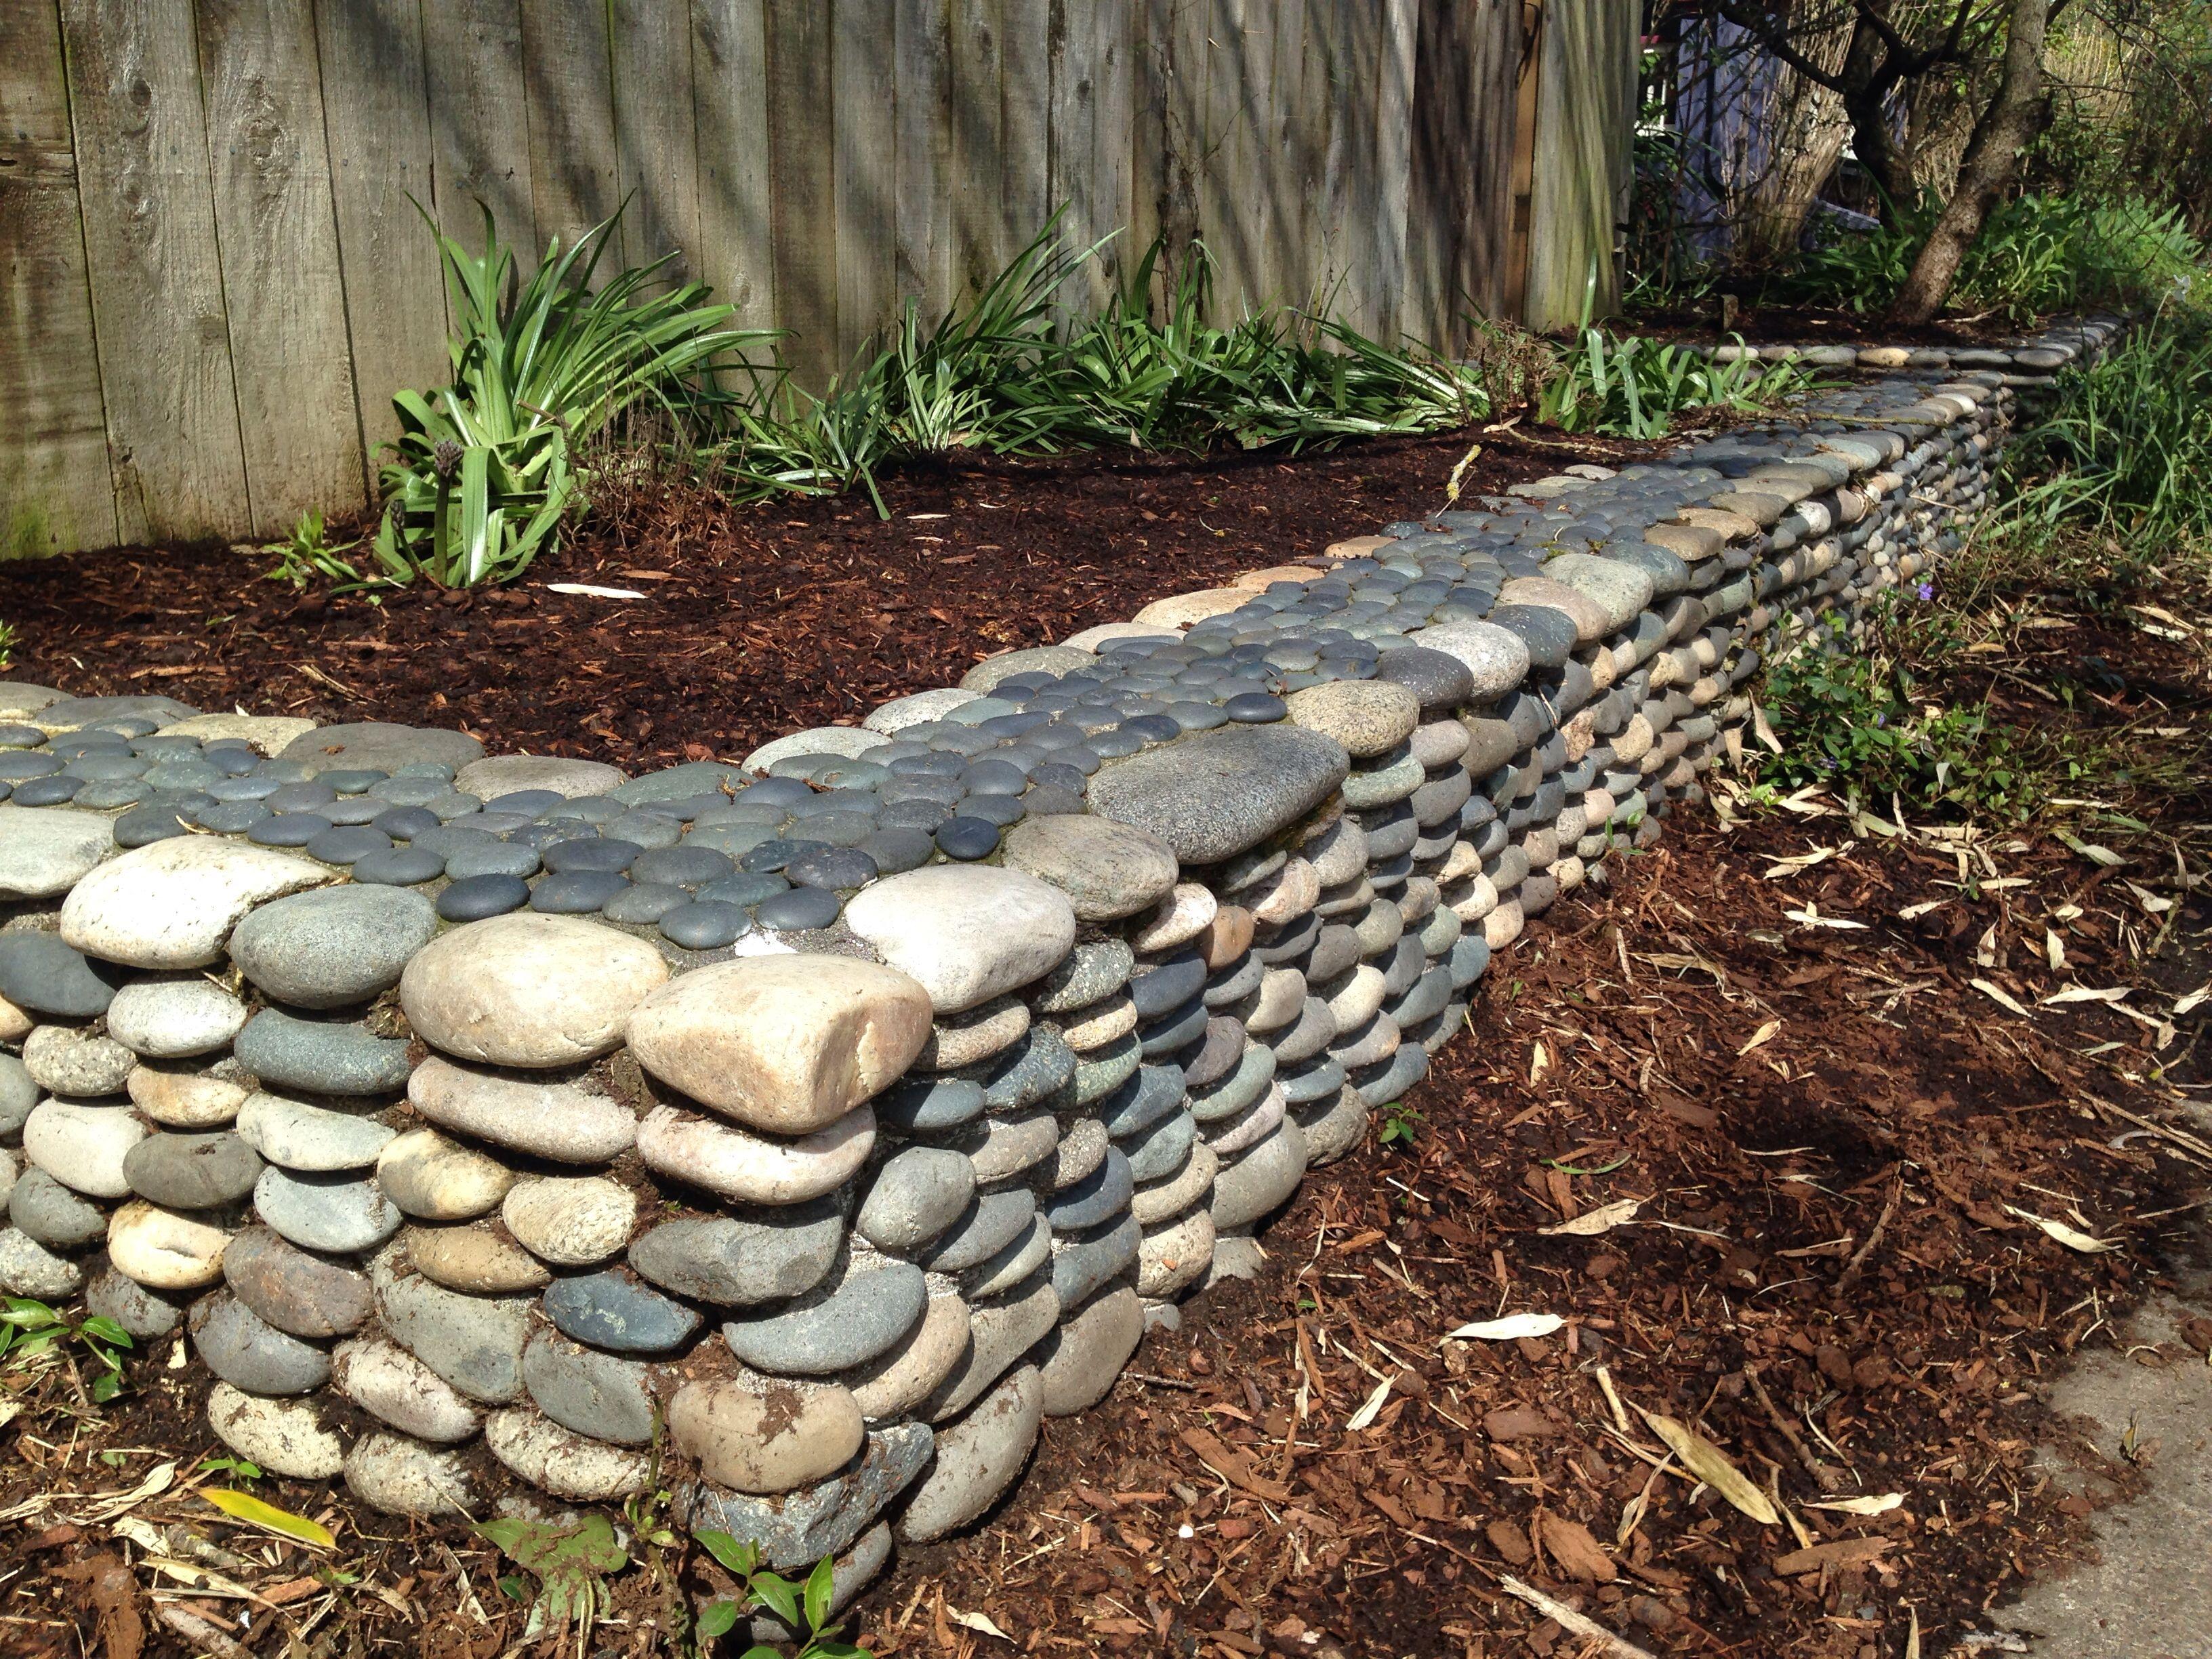 River rock garden border Garden bliss Pinterest Rock garden